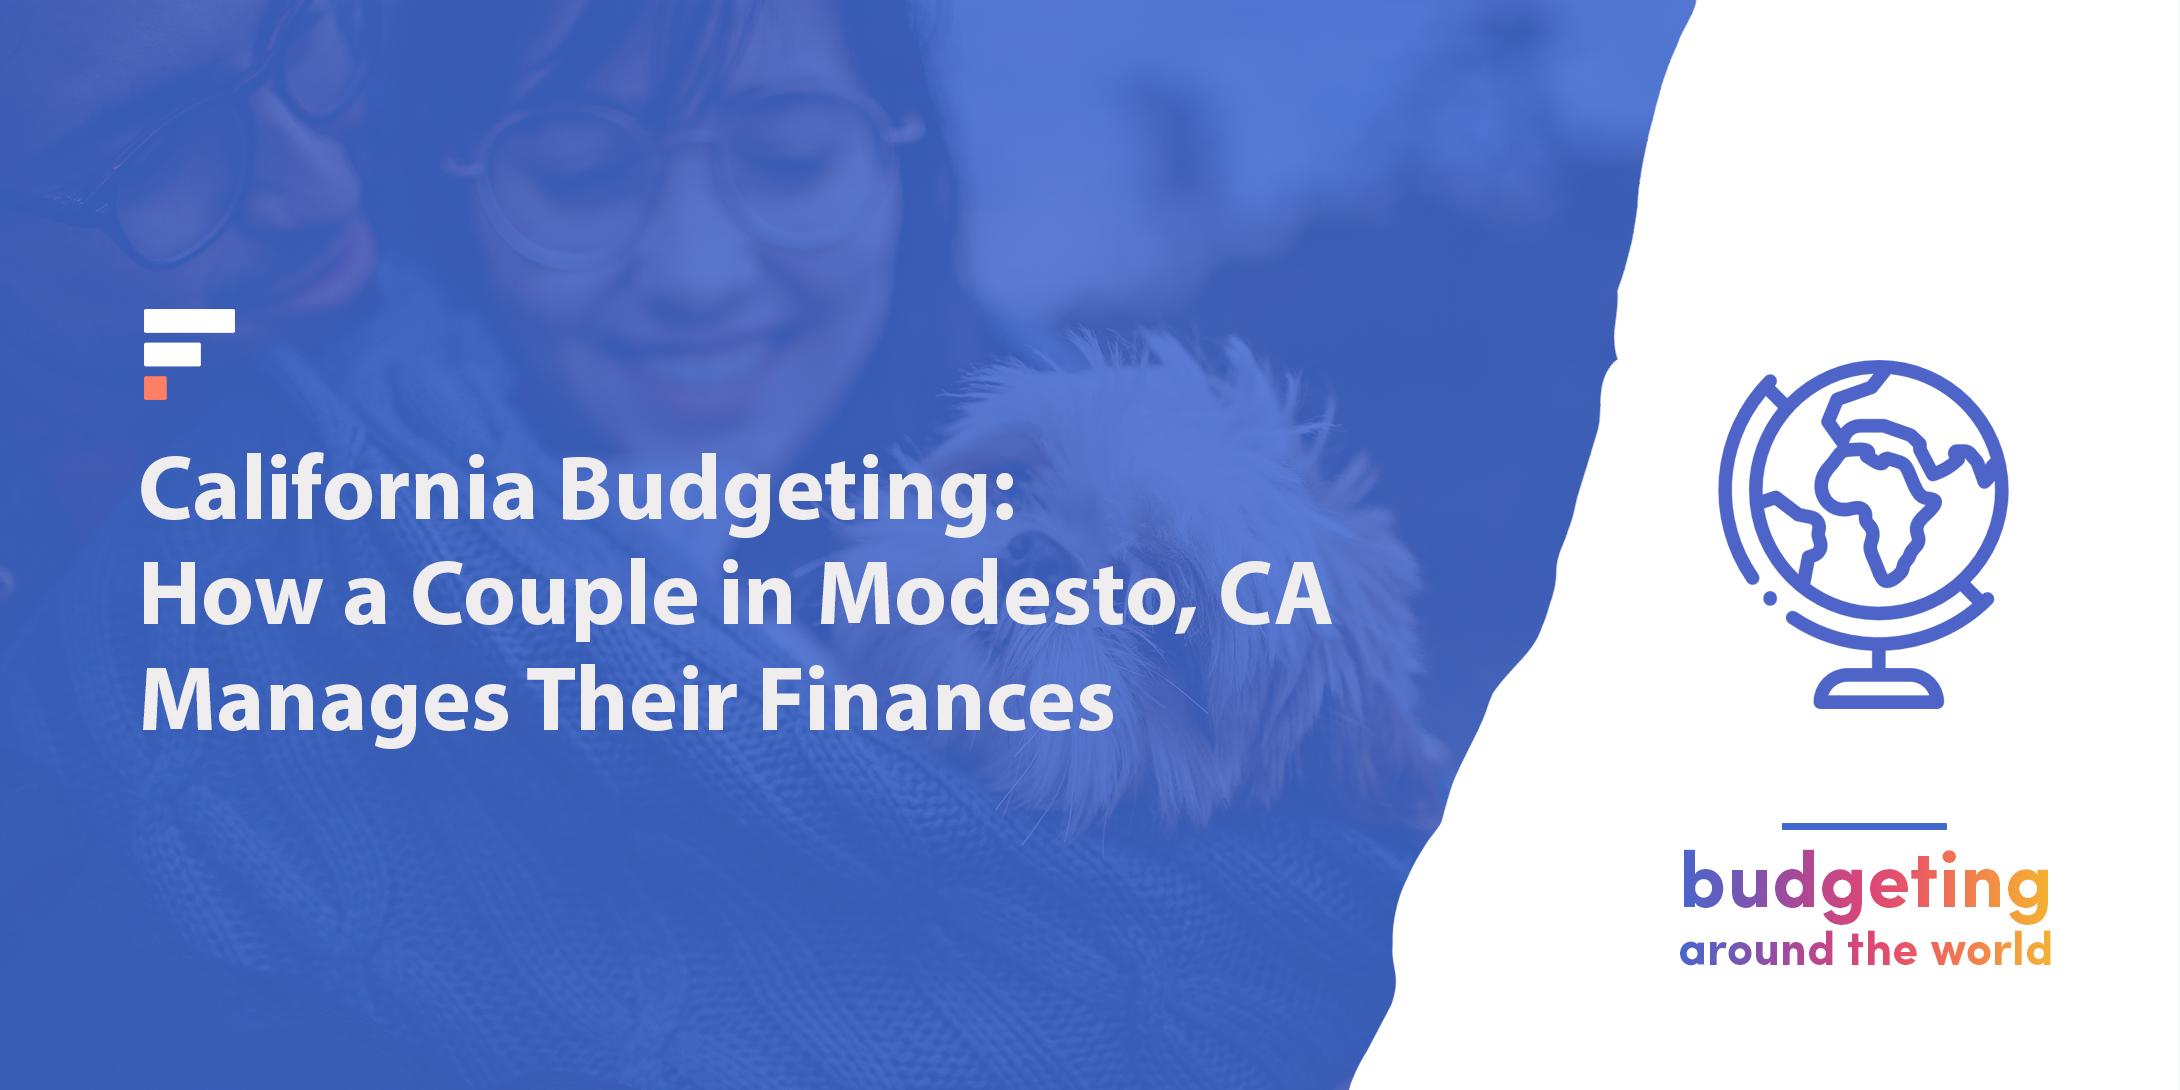 Budgeting in Modesto, California